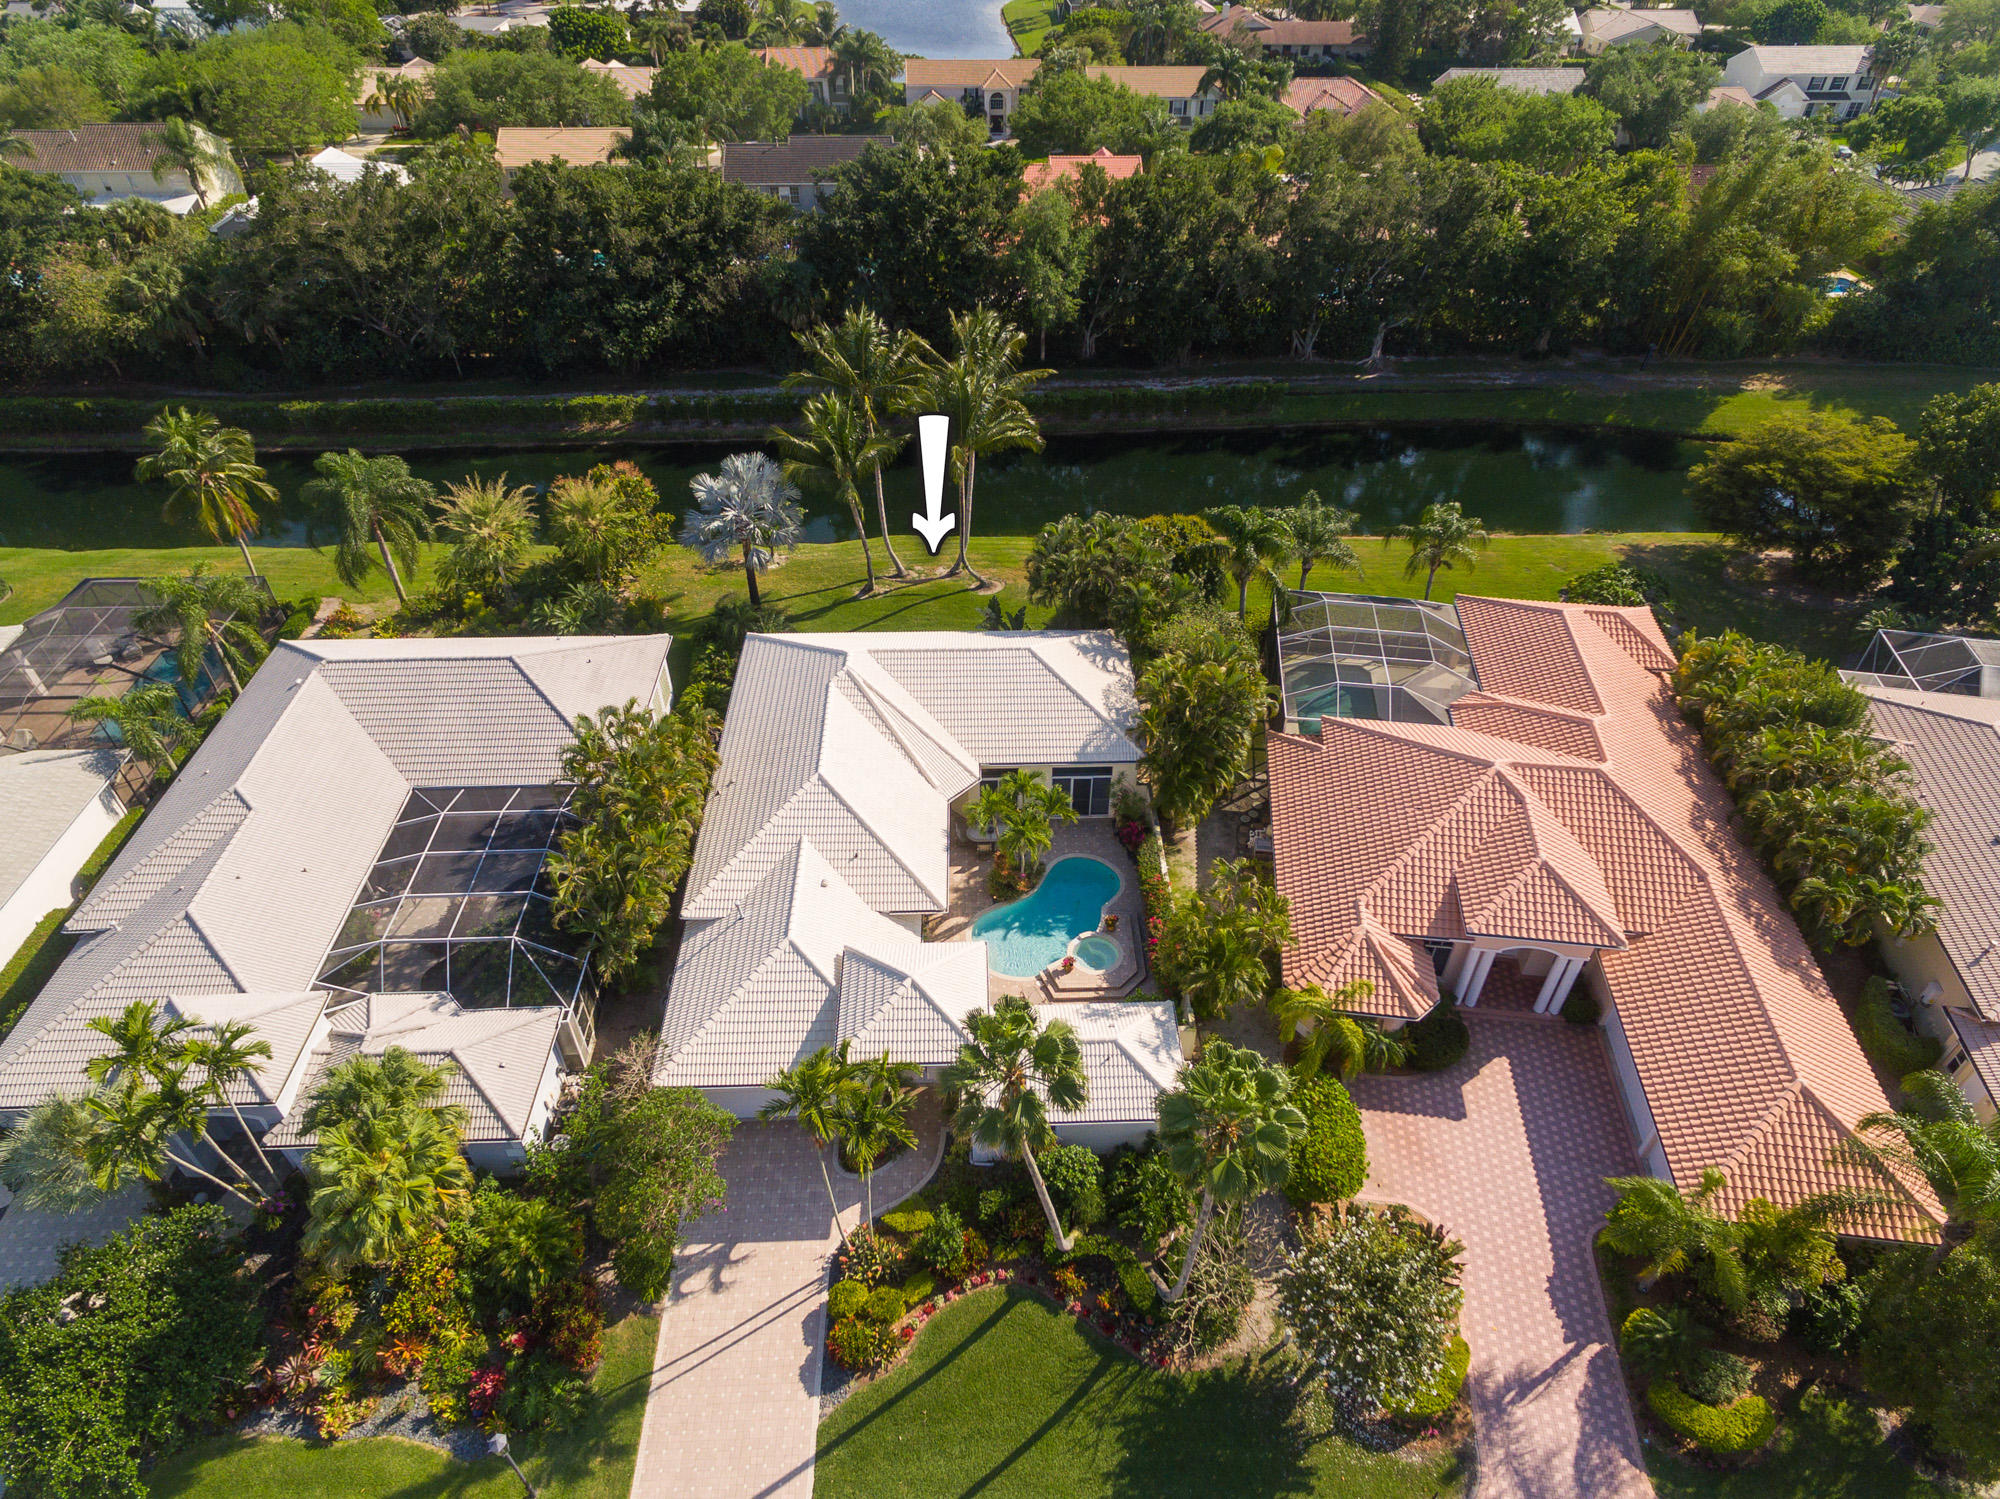 35 Bermuda Lake Drive, Palm Beach Gardens, Florida 33418, 4 Bedrooms Bedrooms, ,3 BathroomsBathrooms,A,Single family,Bermuda Lake,RX-10512113